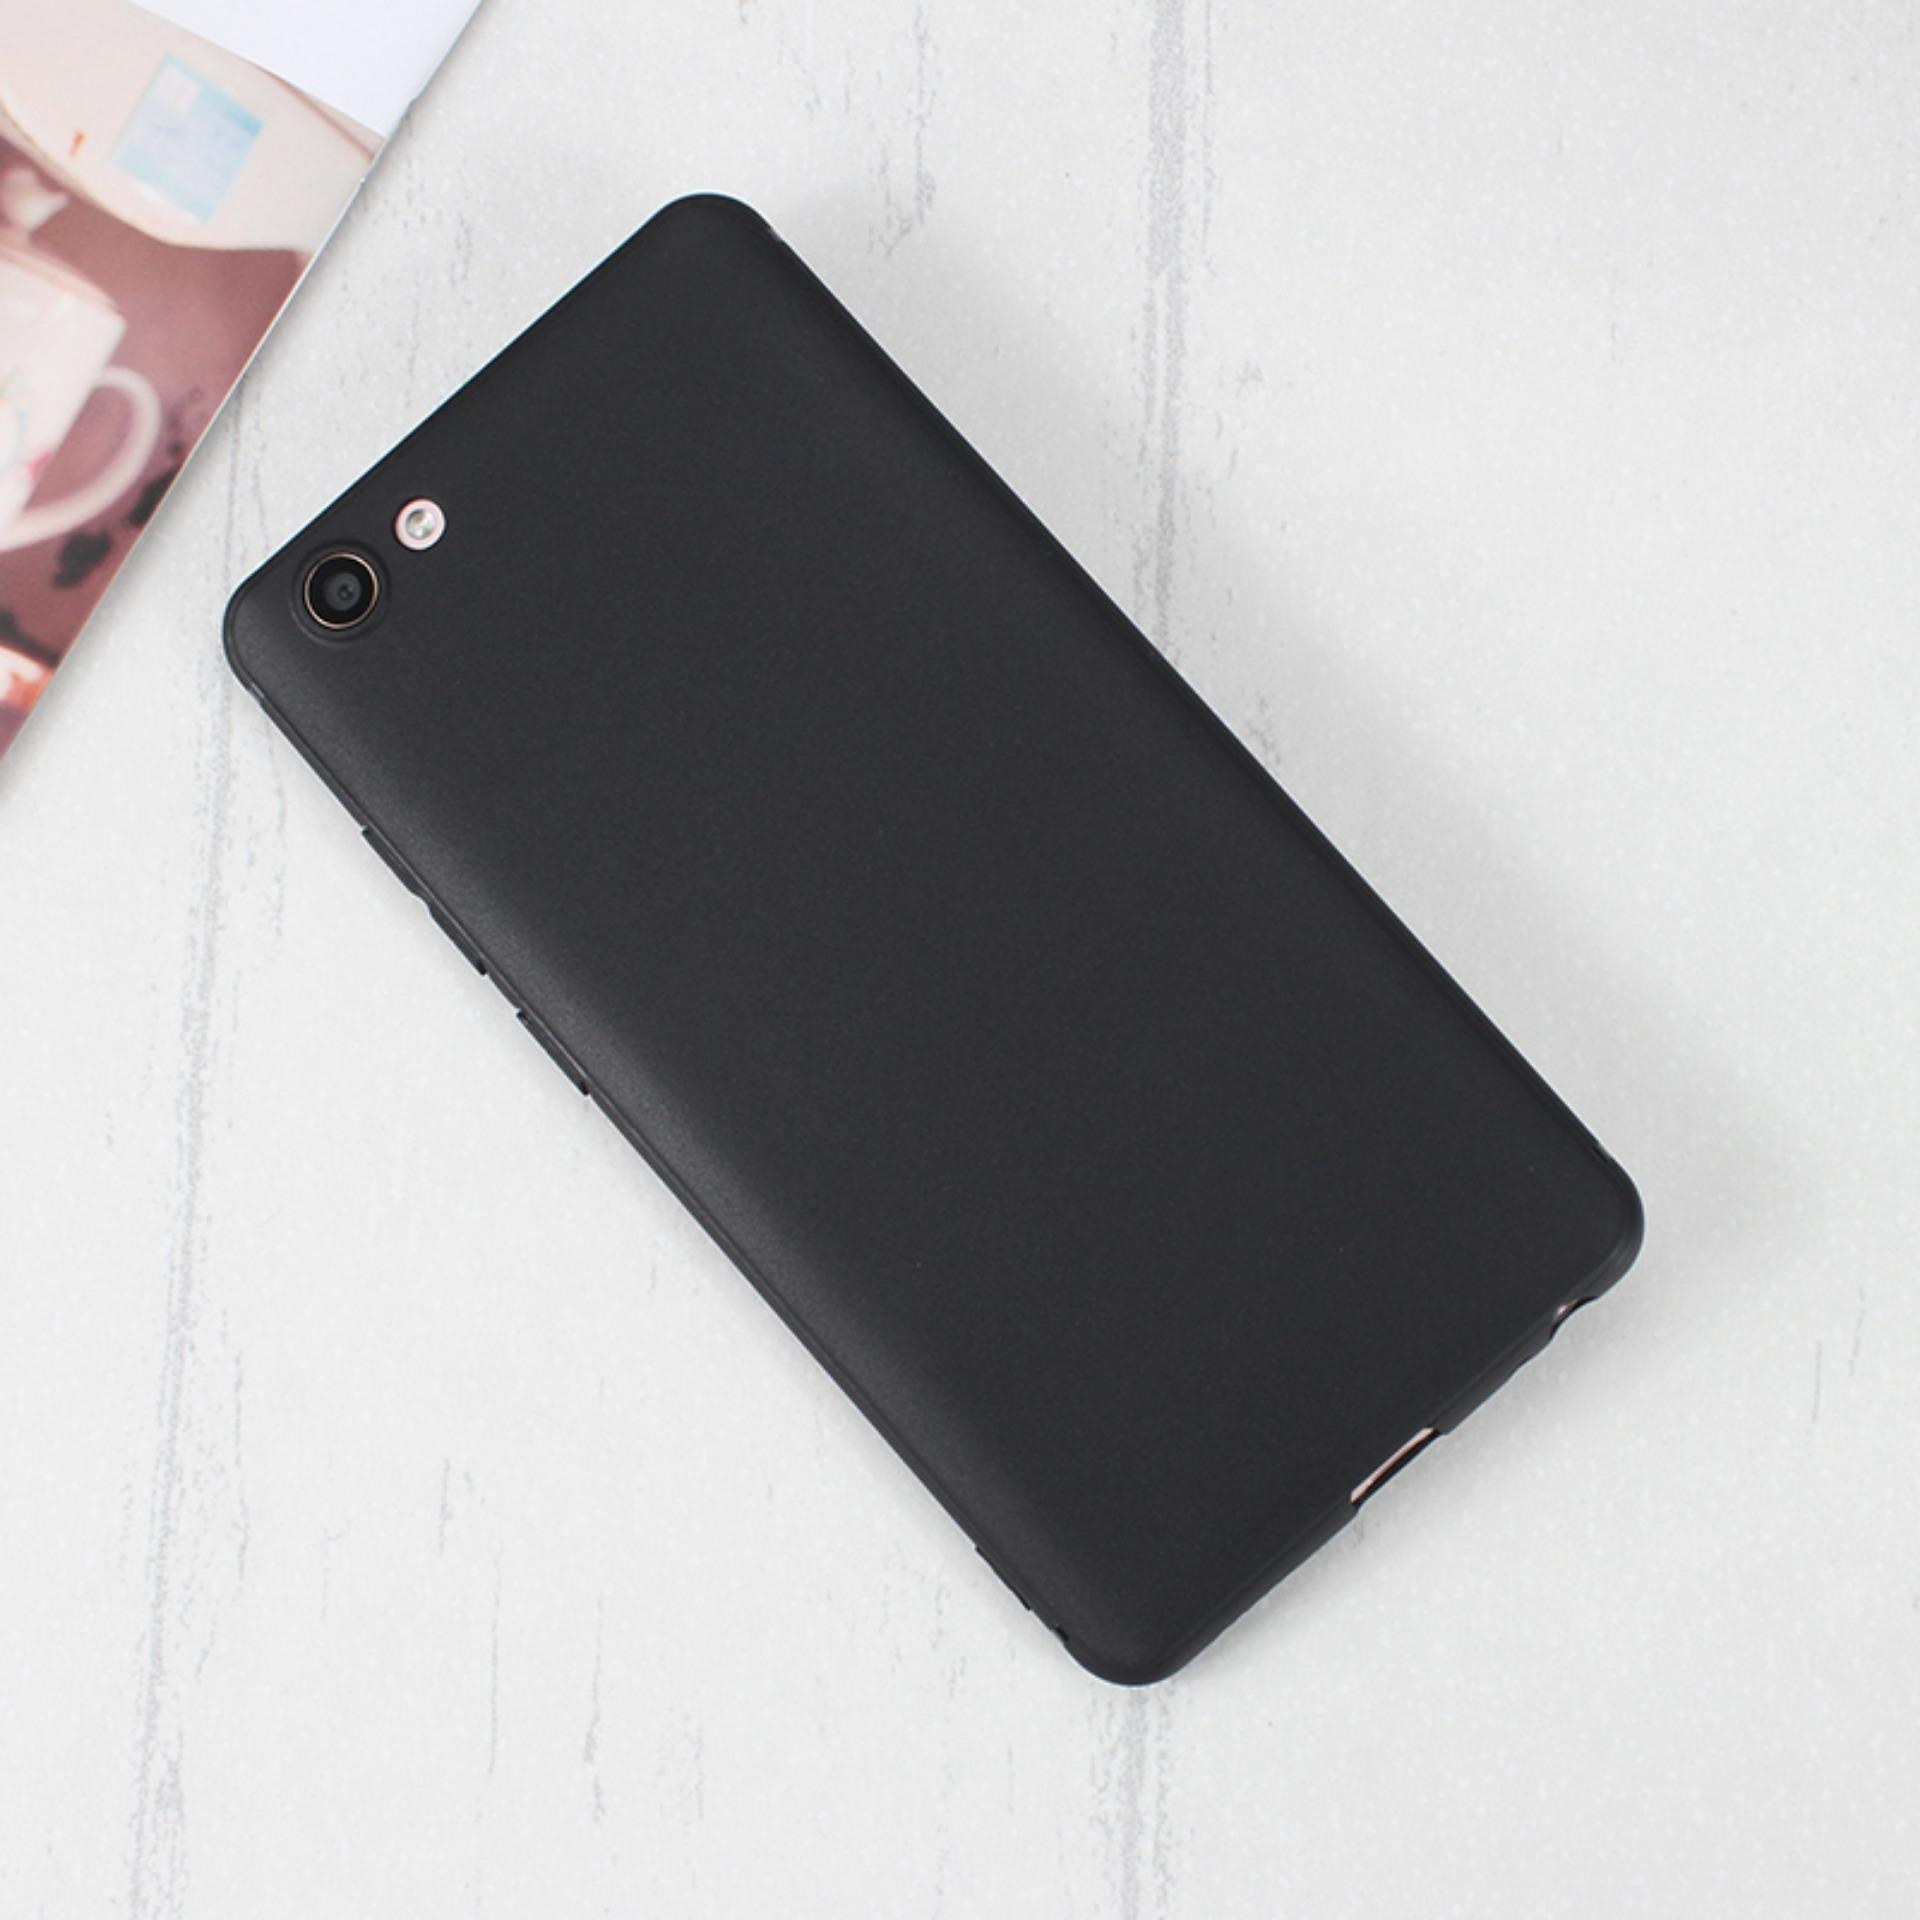 Case Slim Black Matte Vivo Y71 Baby Skin Softcase Ultra Thin Jelly Silikon Babyskin + Free ...